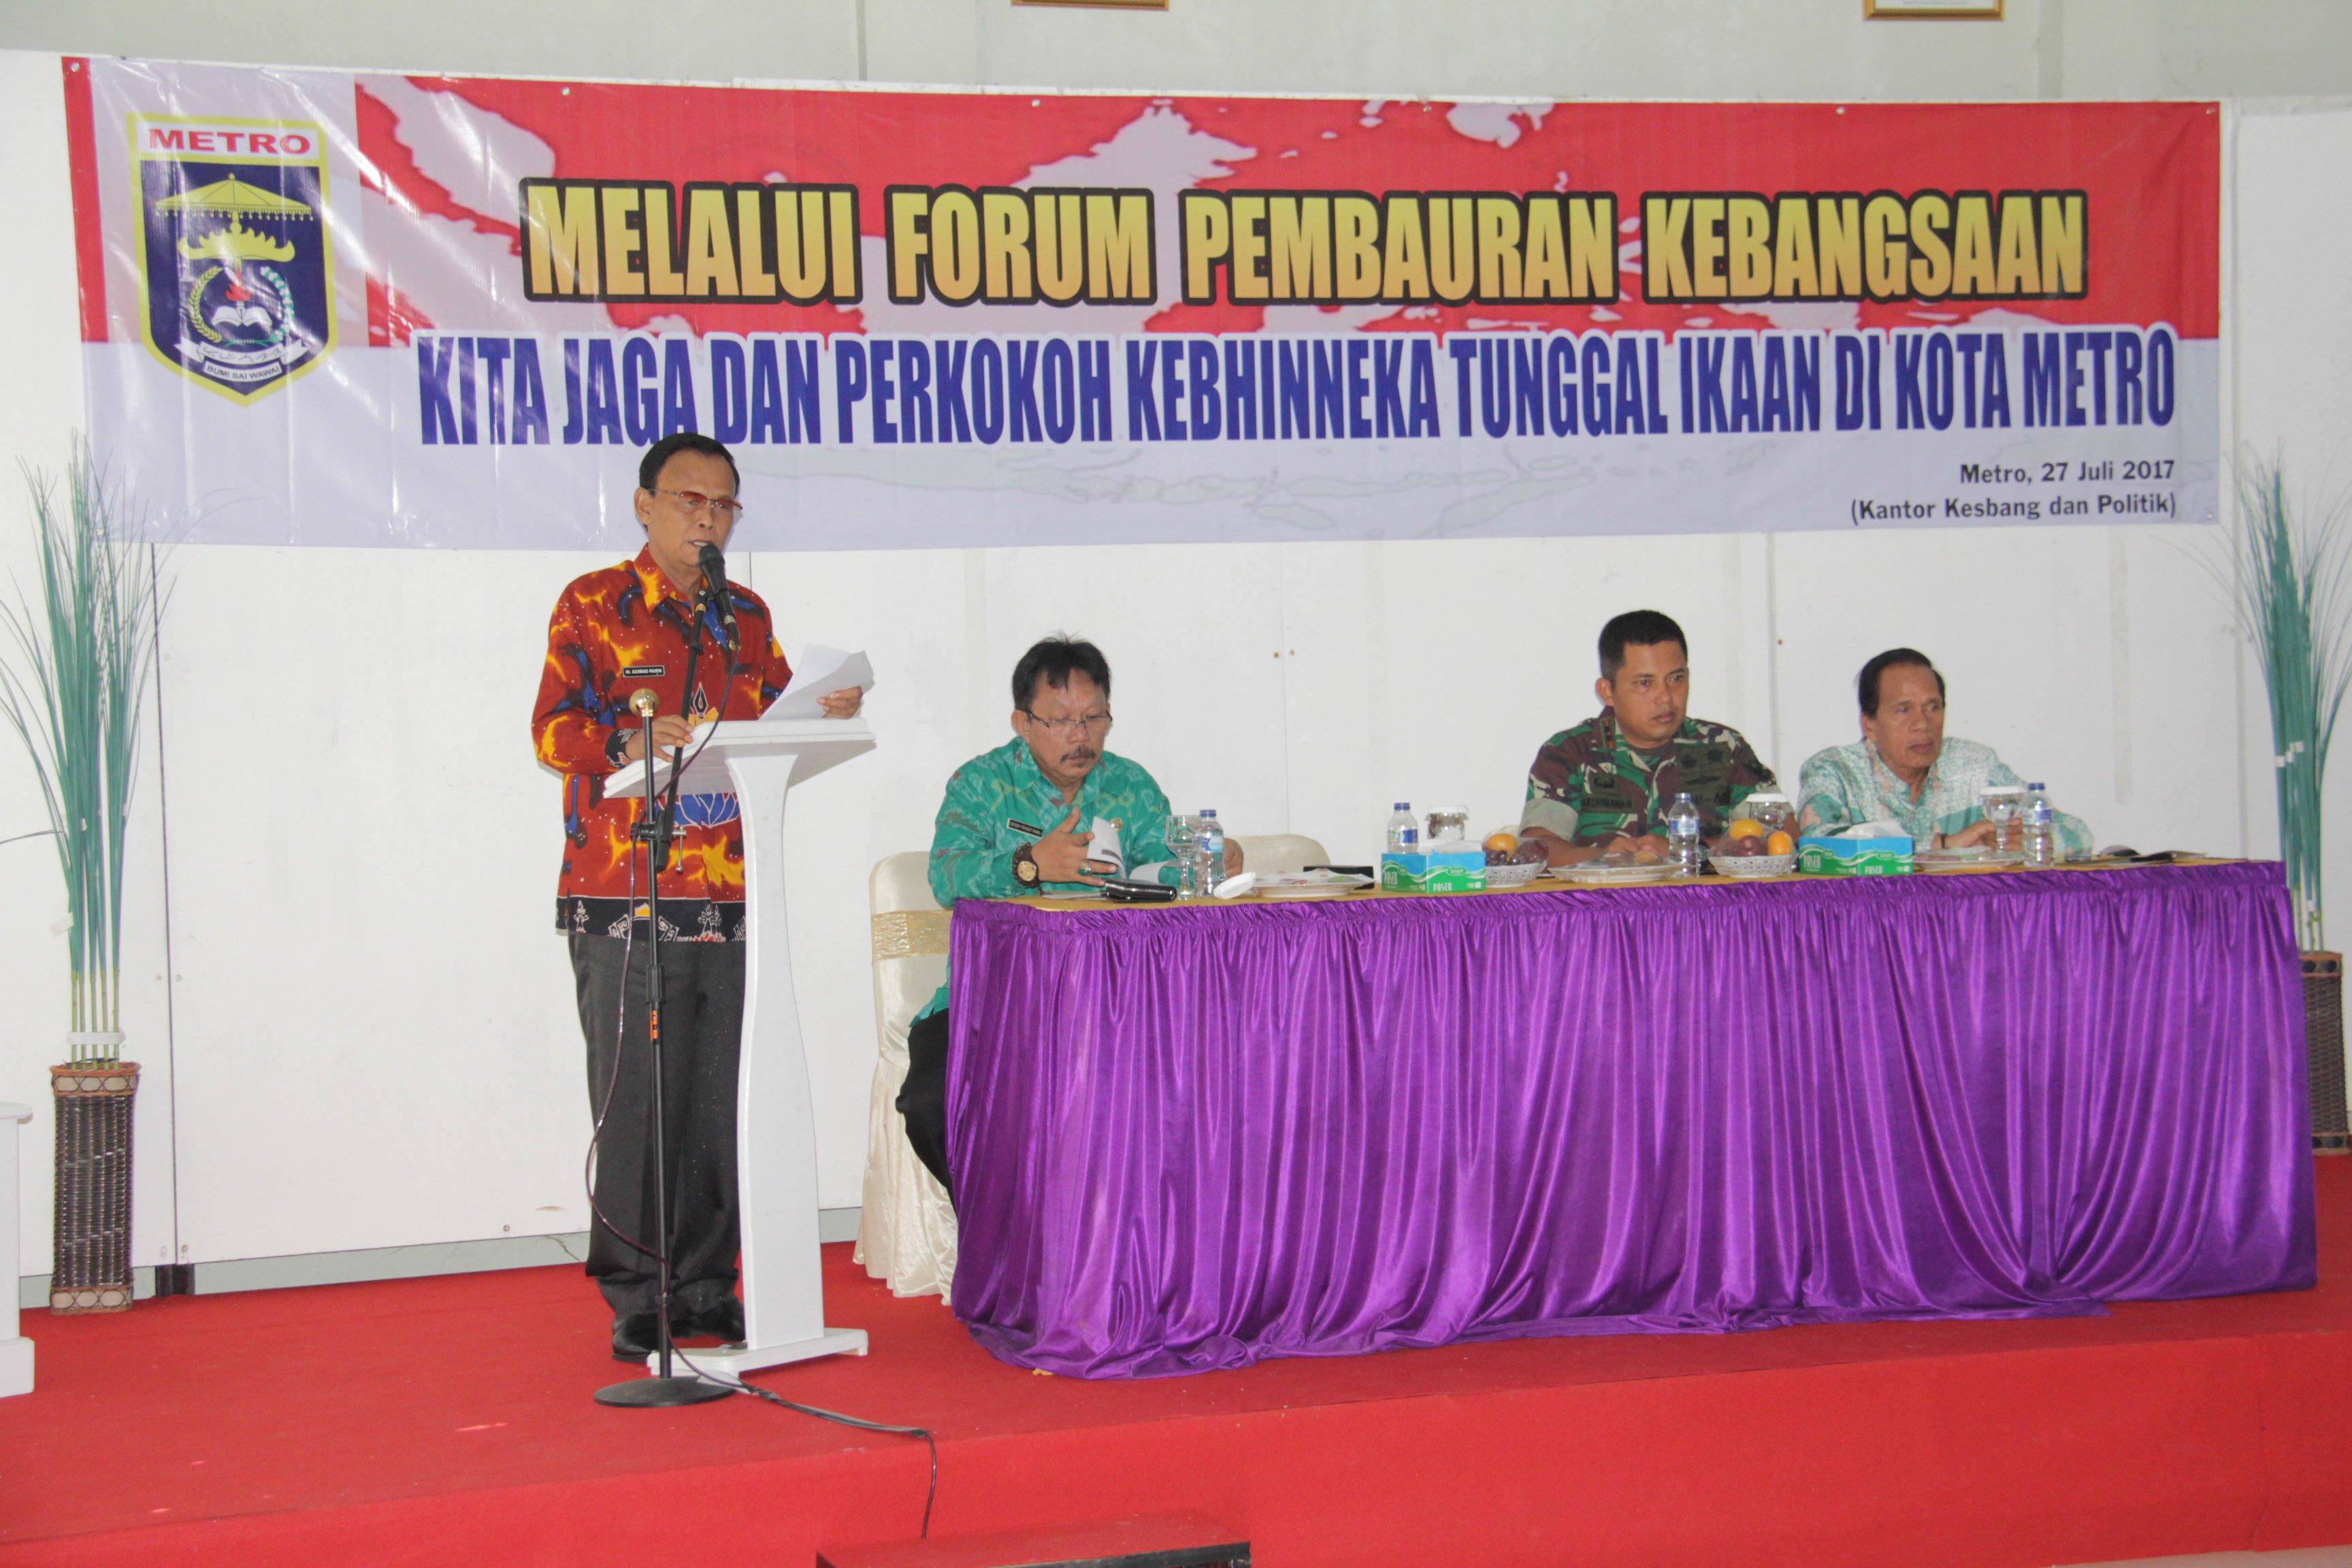 Walikota A. Pairin Saat Memberi Sambutan Pada Acara Sosialisasi Forum Pembauran Kebangsaan Kesbangpol Kota Metro.